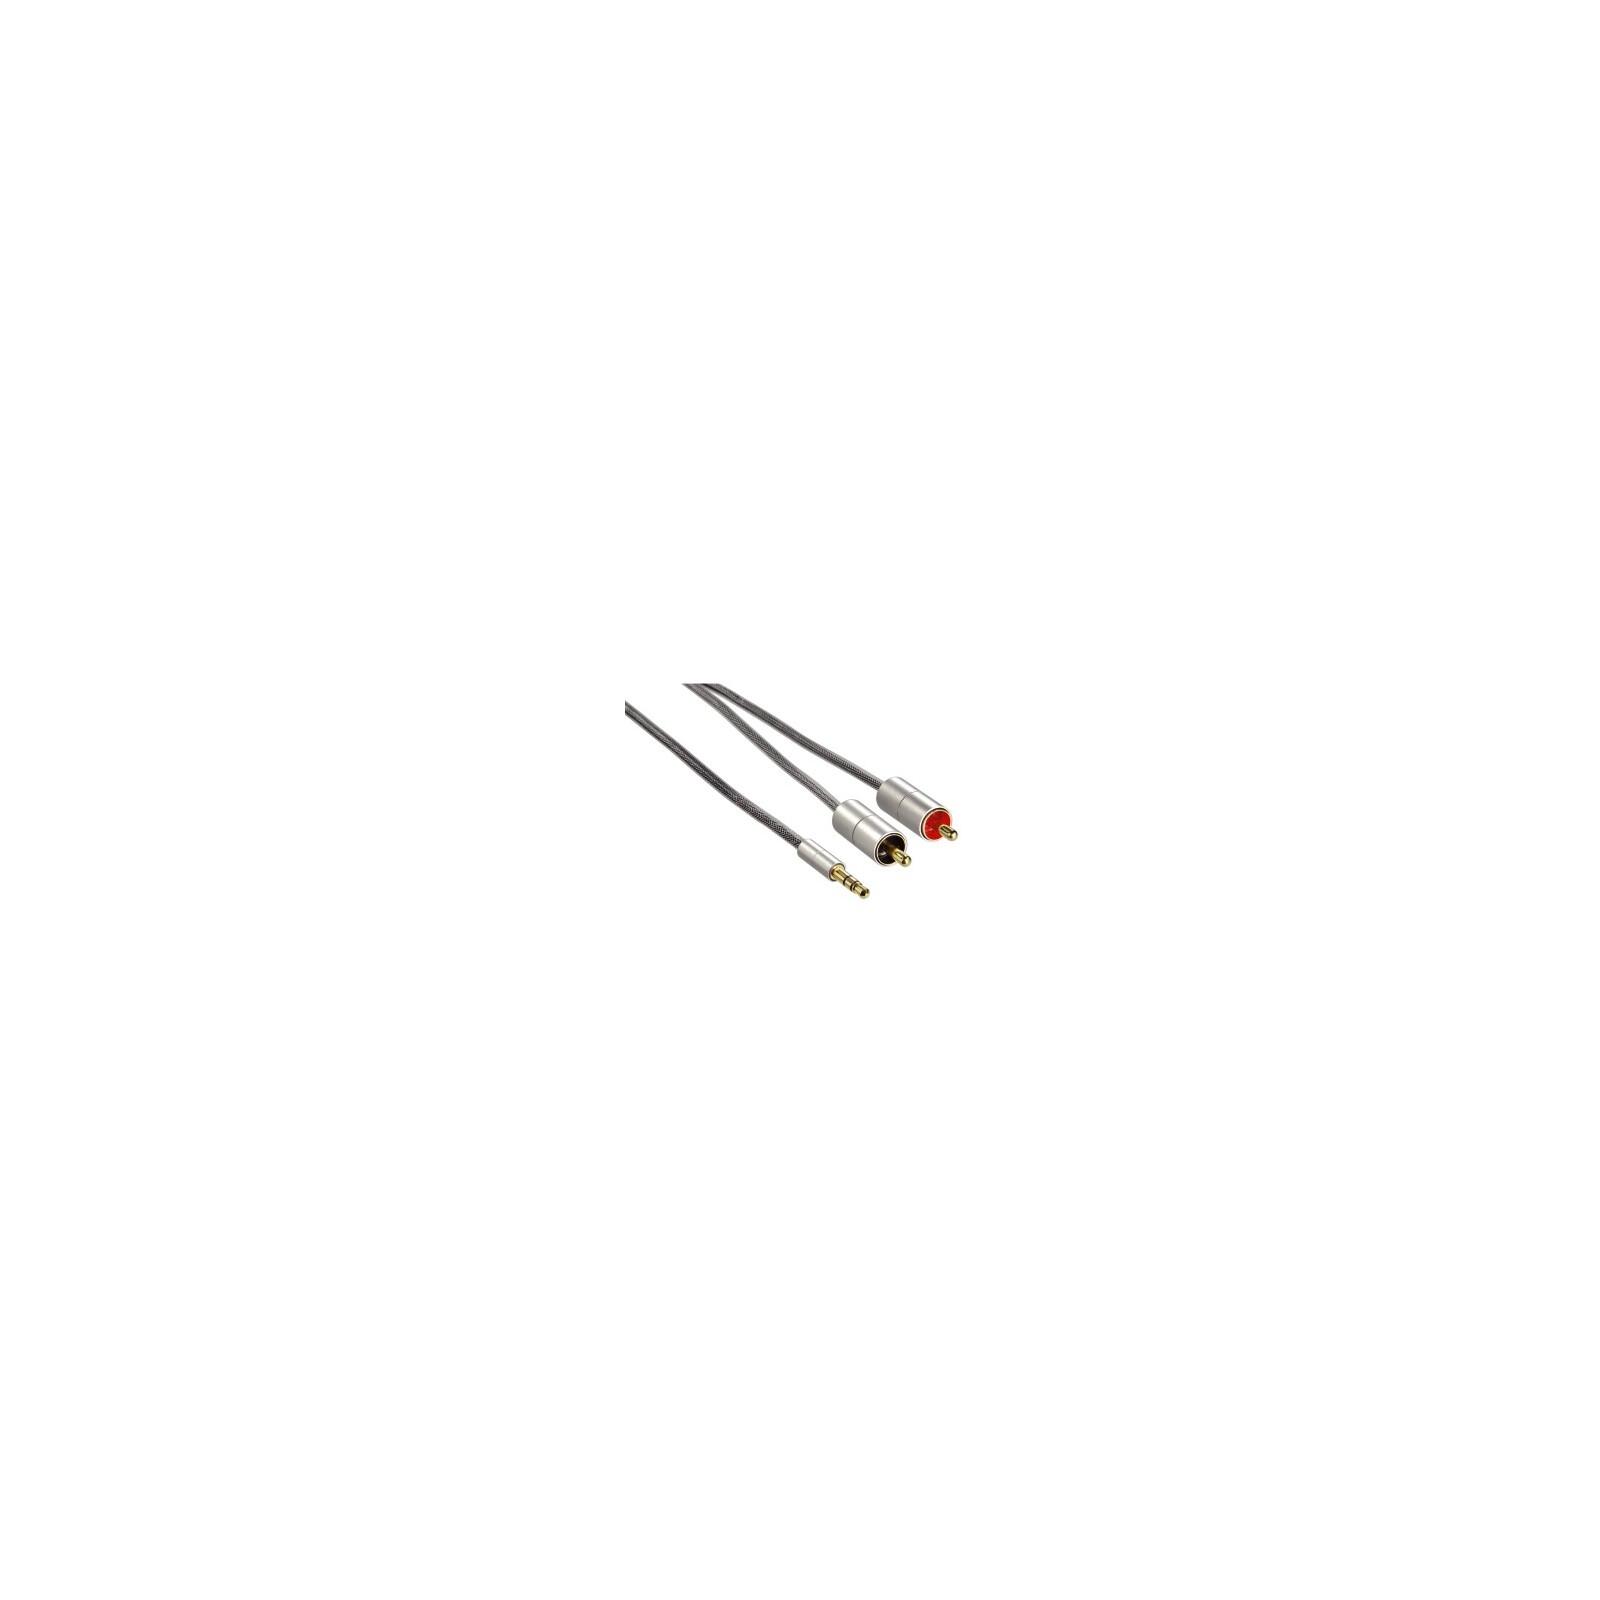 Hama 80864 Verbindungskabel AluLine Klinkenst. 3,5 mm